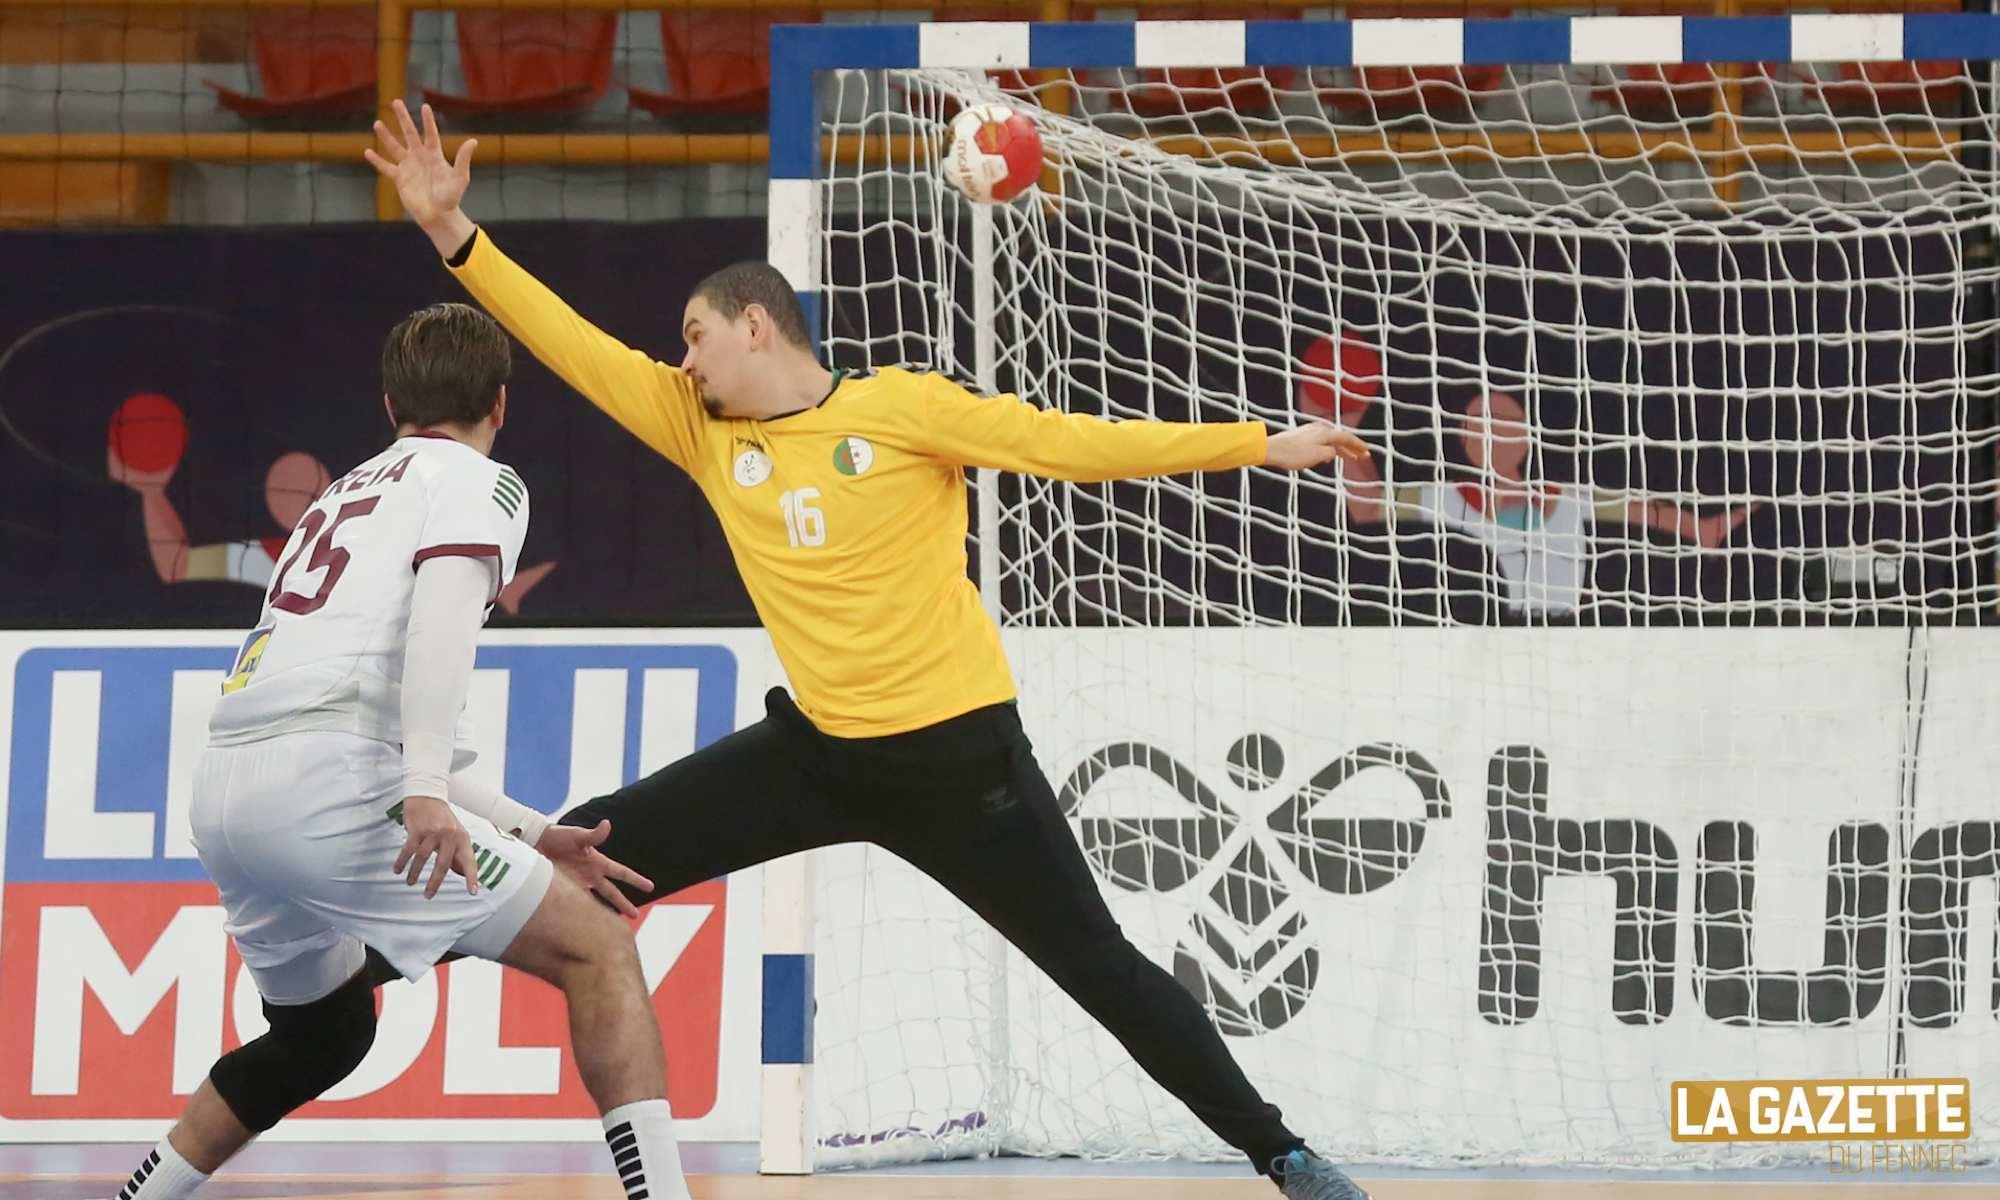 zemouchi gardien handball portugal egypt2021